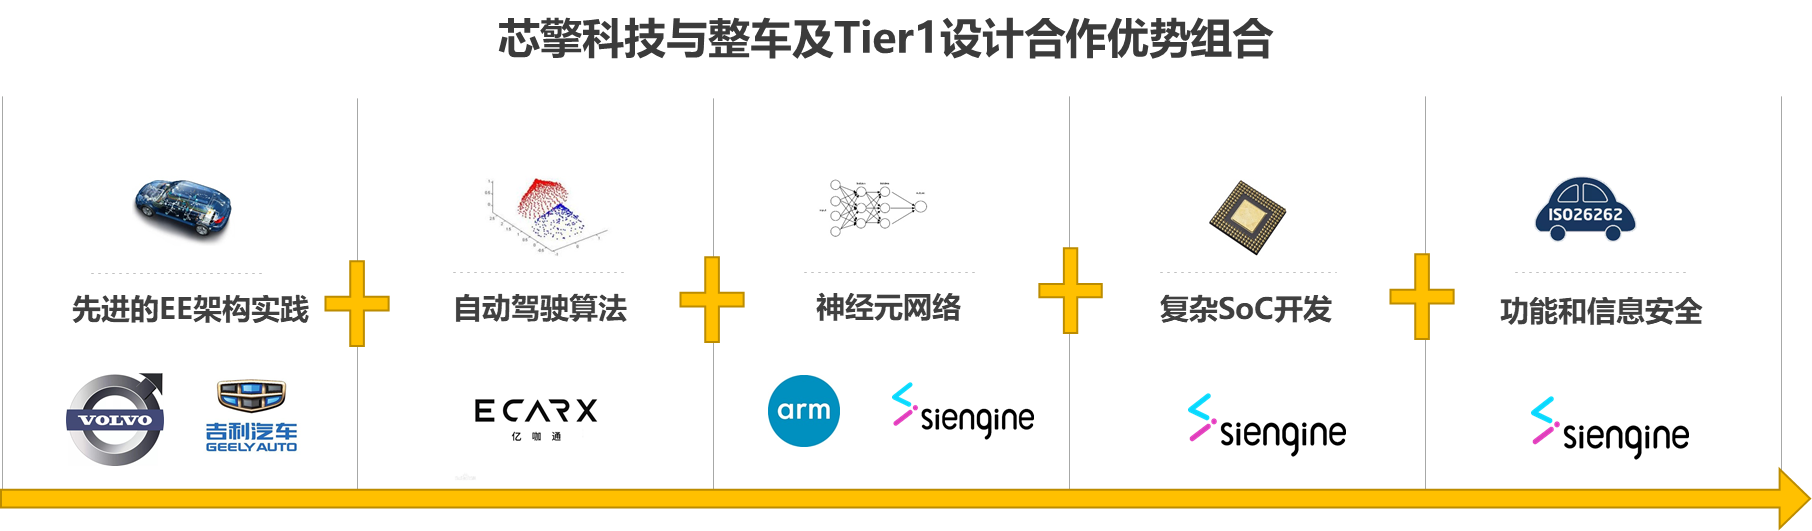 《7NM-算力和架构设计场景分析》配图6.png